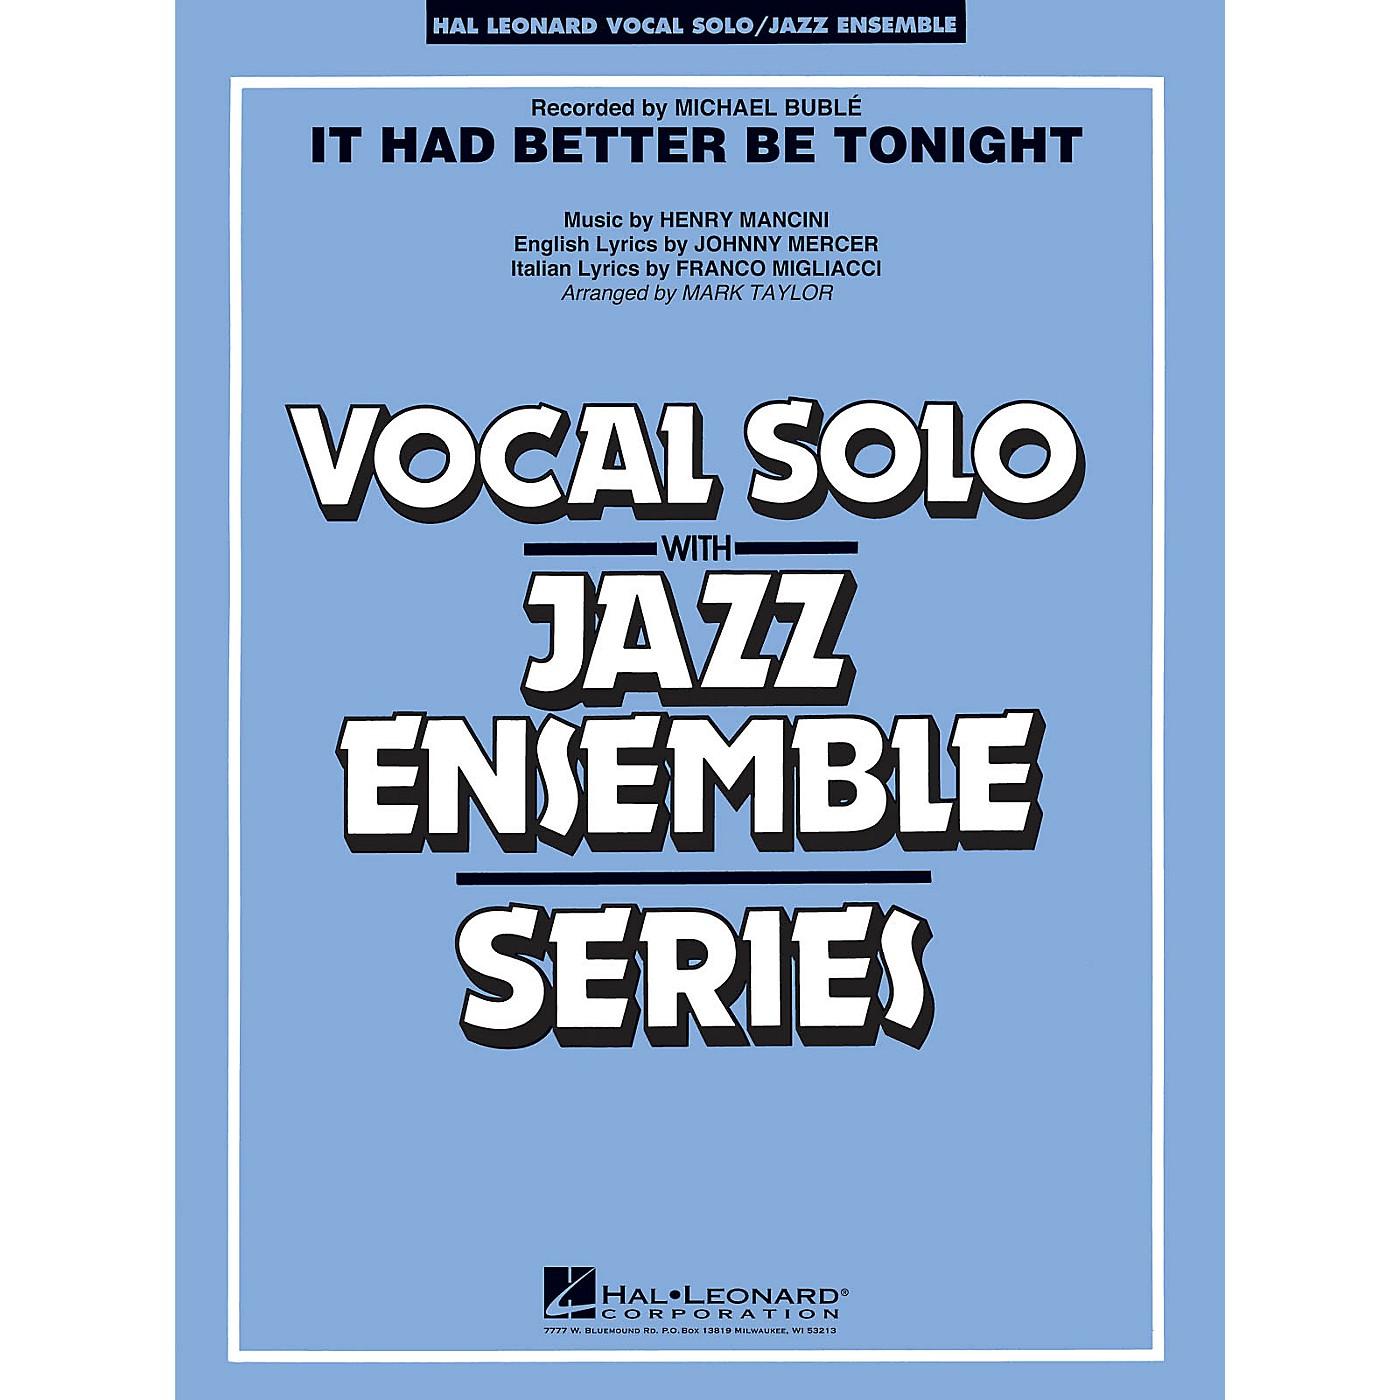 Hal Leonard It Had Better Be Tonight (Key: Gmi-Ami) Jazz Band Level 3-4 Composed by Henry Mancini thumbnail